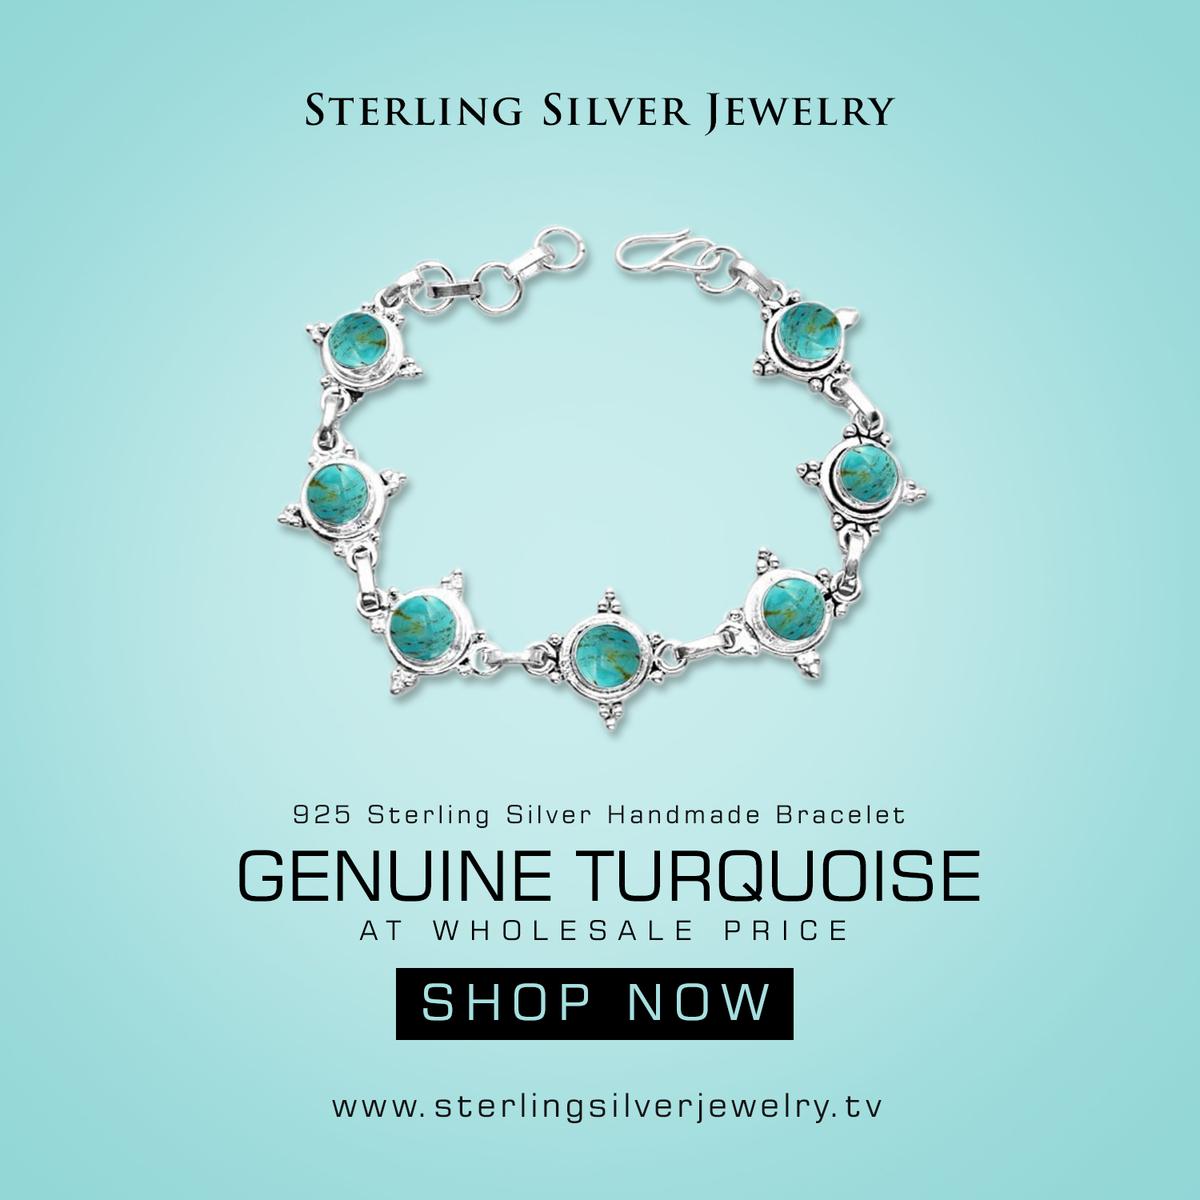 f:id:sterlingsilverjewelry:20190814213137j:plain